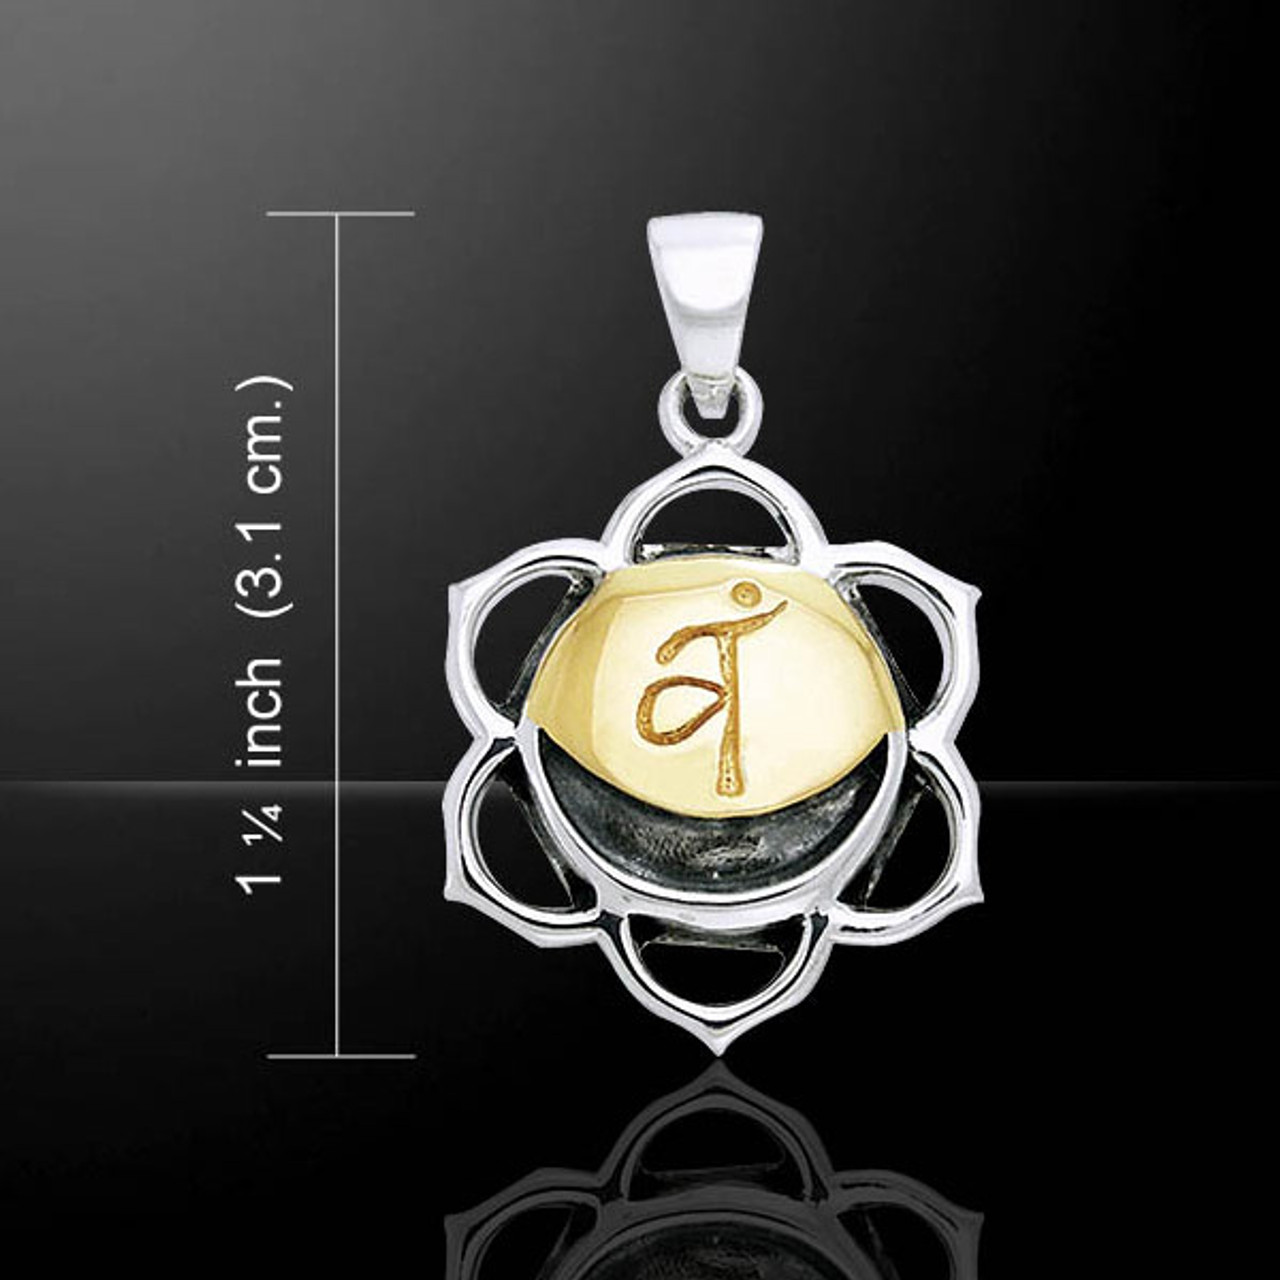 Sacral Chakra Pendant (Joy) - Sterling Silver & Gold